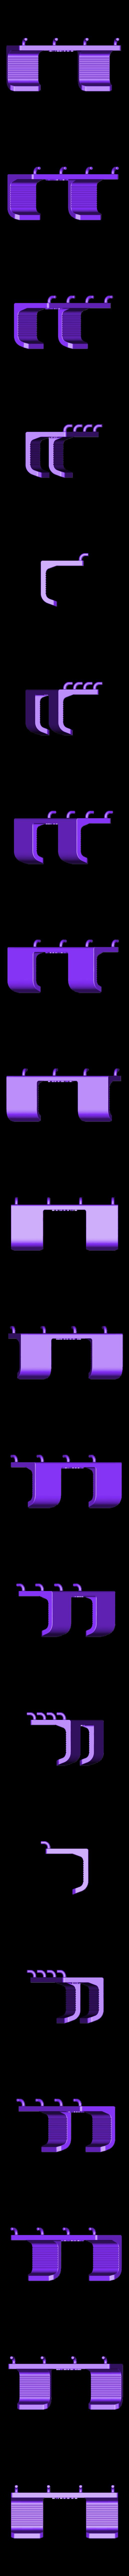 enforce_300_pins.stl Download free STL file Engineers Hammer Holder 300g 028 I for screws or peg board • Model to 3D print, Wiesemann1893